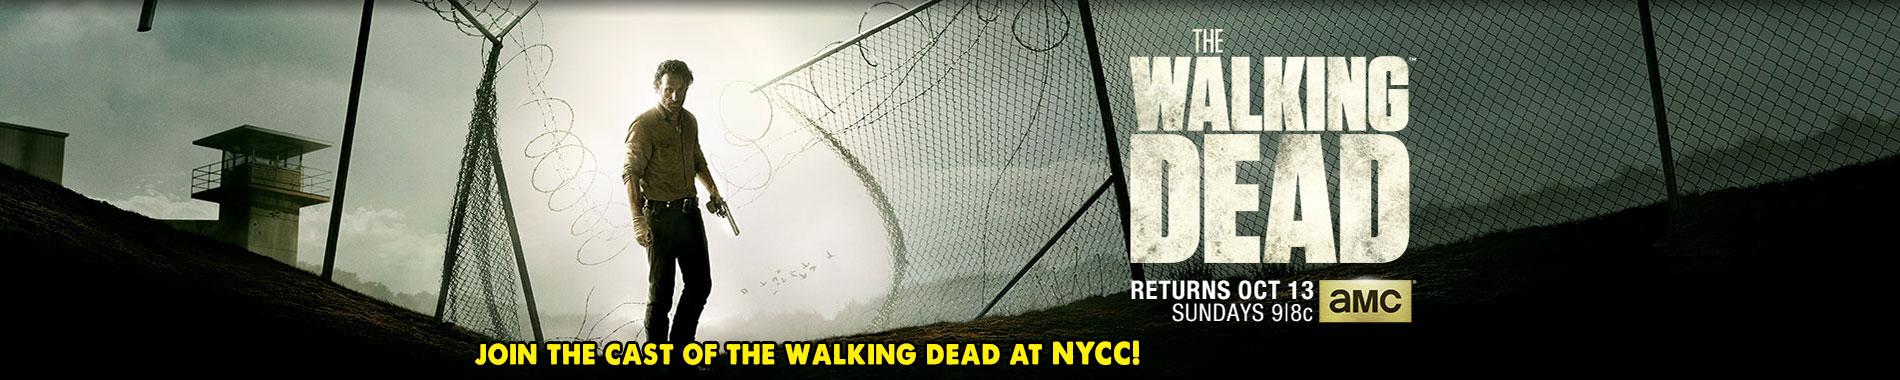 nycc-the-walking-dead-slider